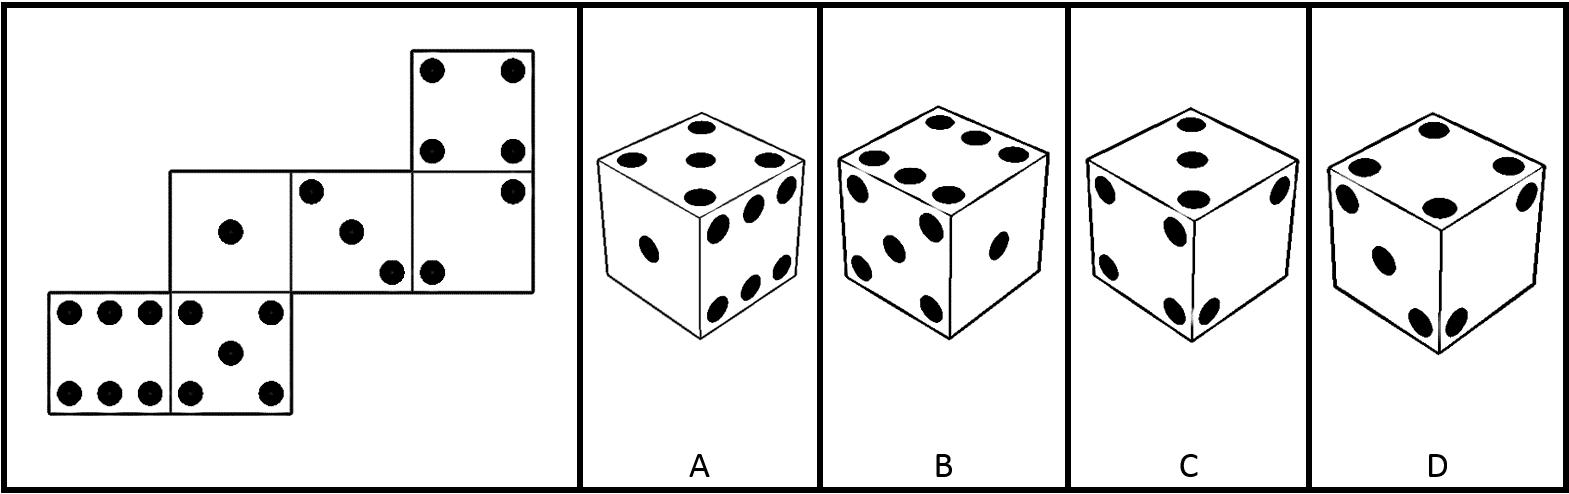 Pattern Folding7_post